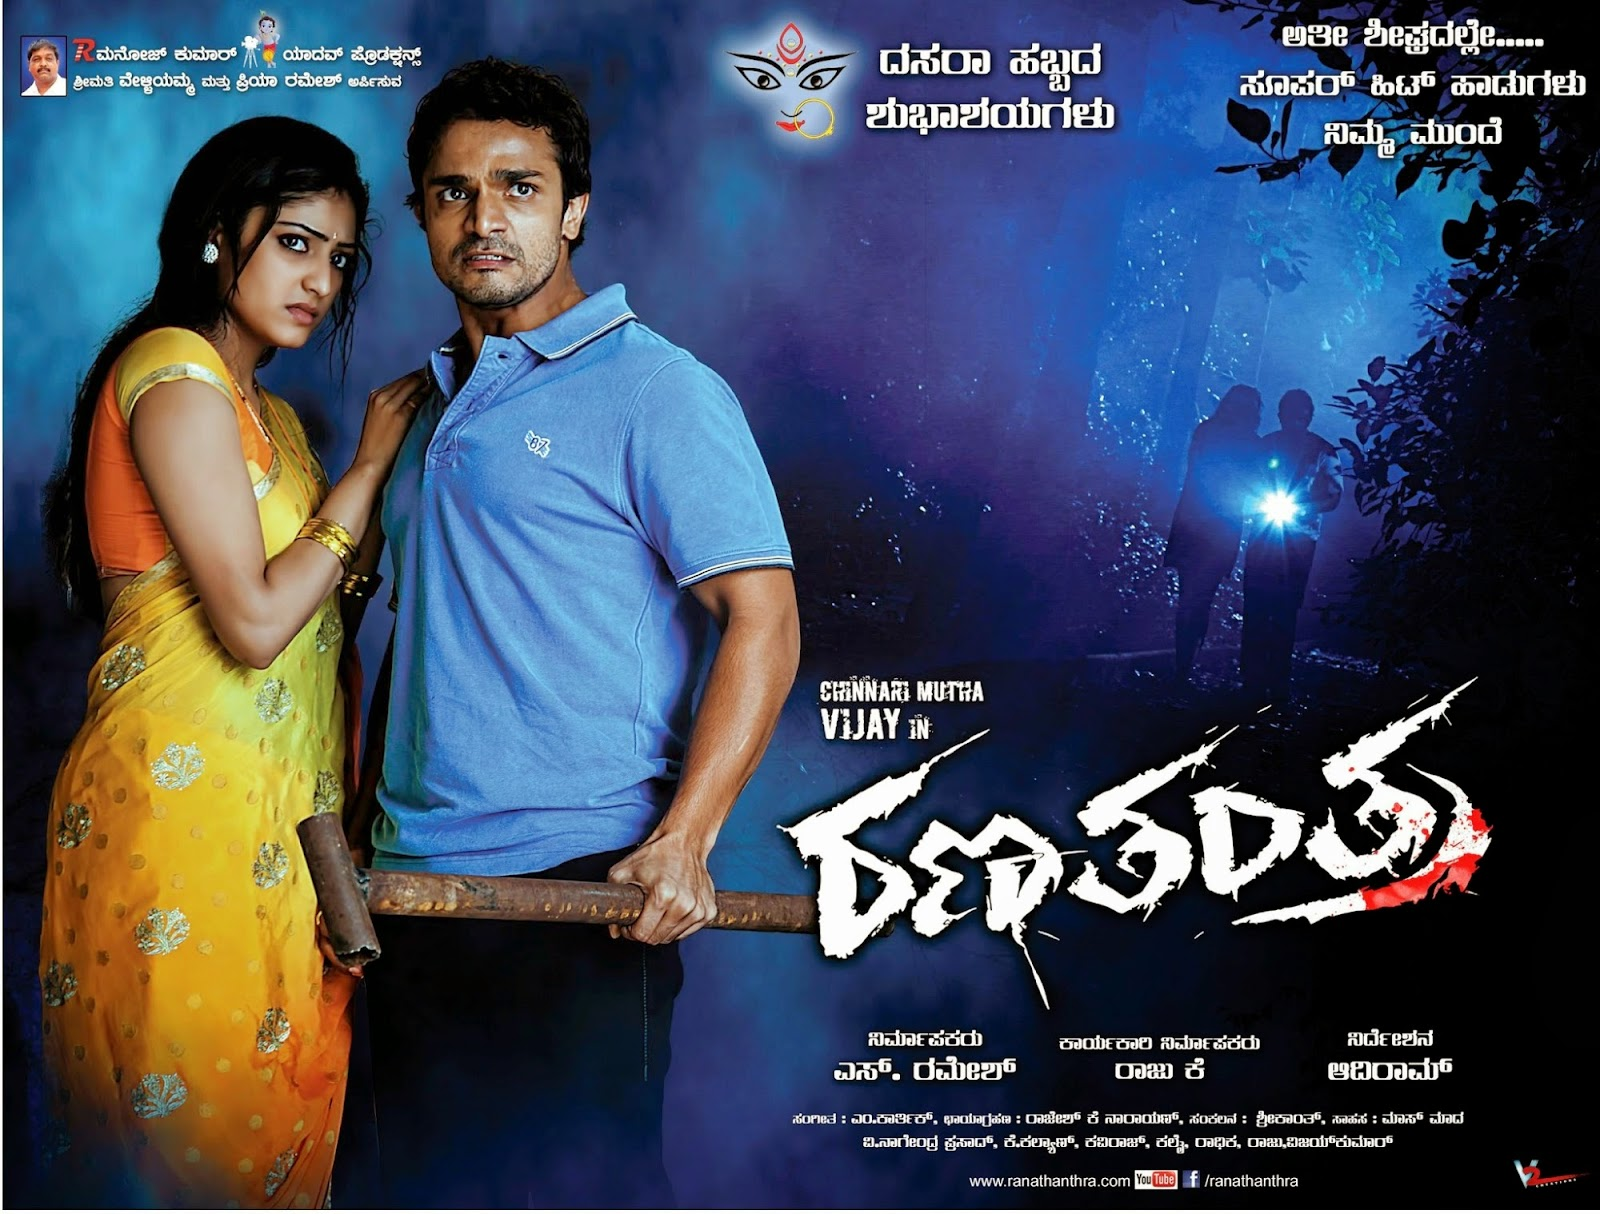 Ranatantra (2014) kannada Movie Mp3 Songs Download